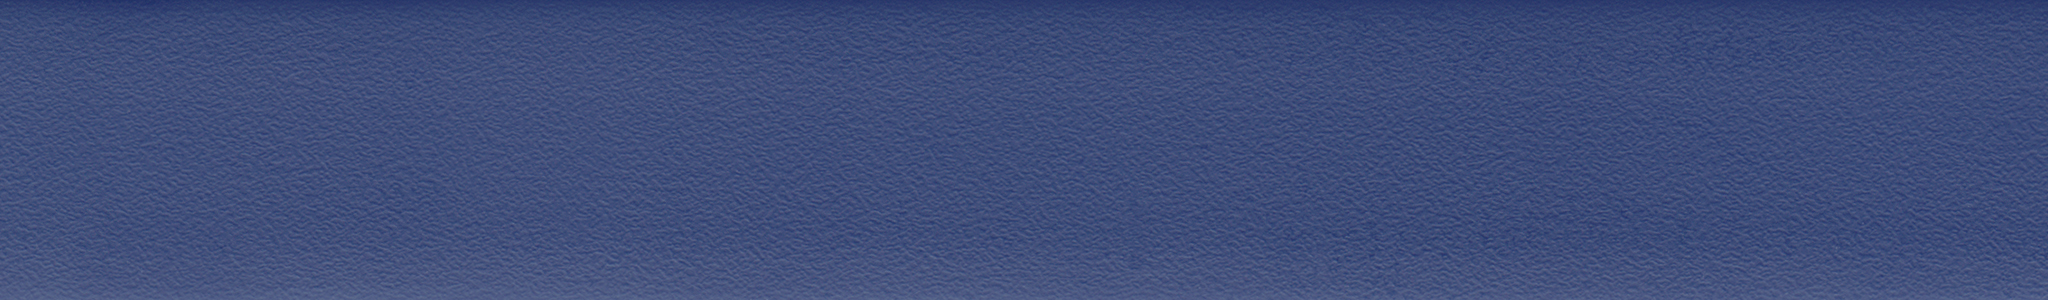 HU 15570 кромка ABS синяя ночная жемчуг XG